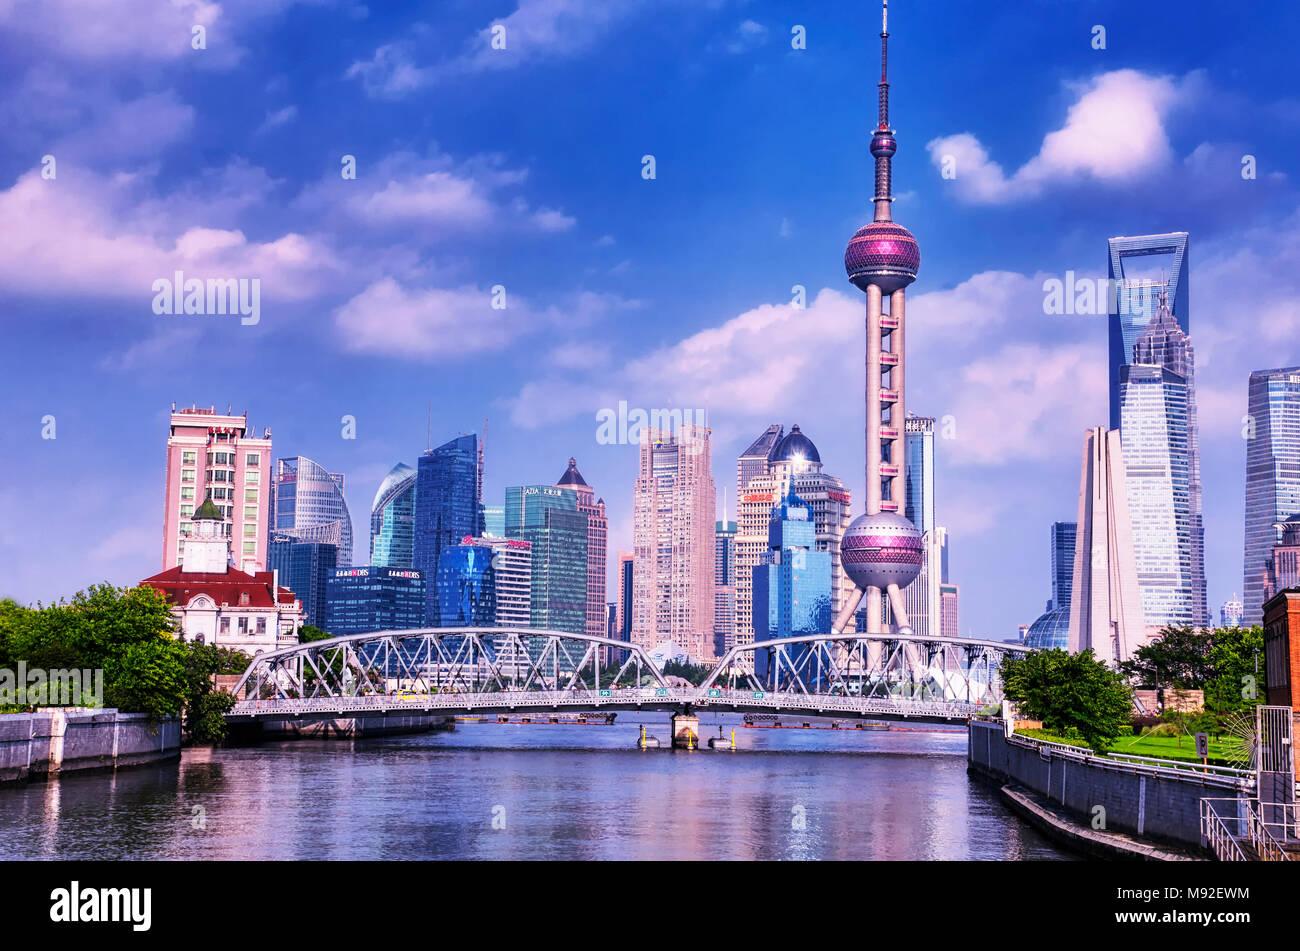 July 15, 2015.  Shanghai, China.  The Waibaidu (garden) bridge over the Wusong River (Suzhou Creek) with the modern buildings of Lujiazui in the backg Stock Photo